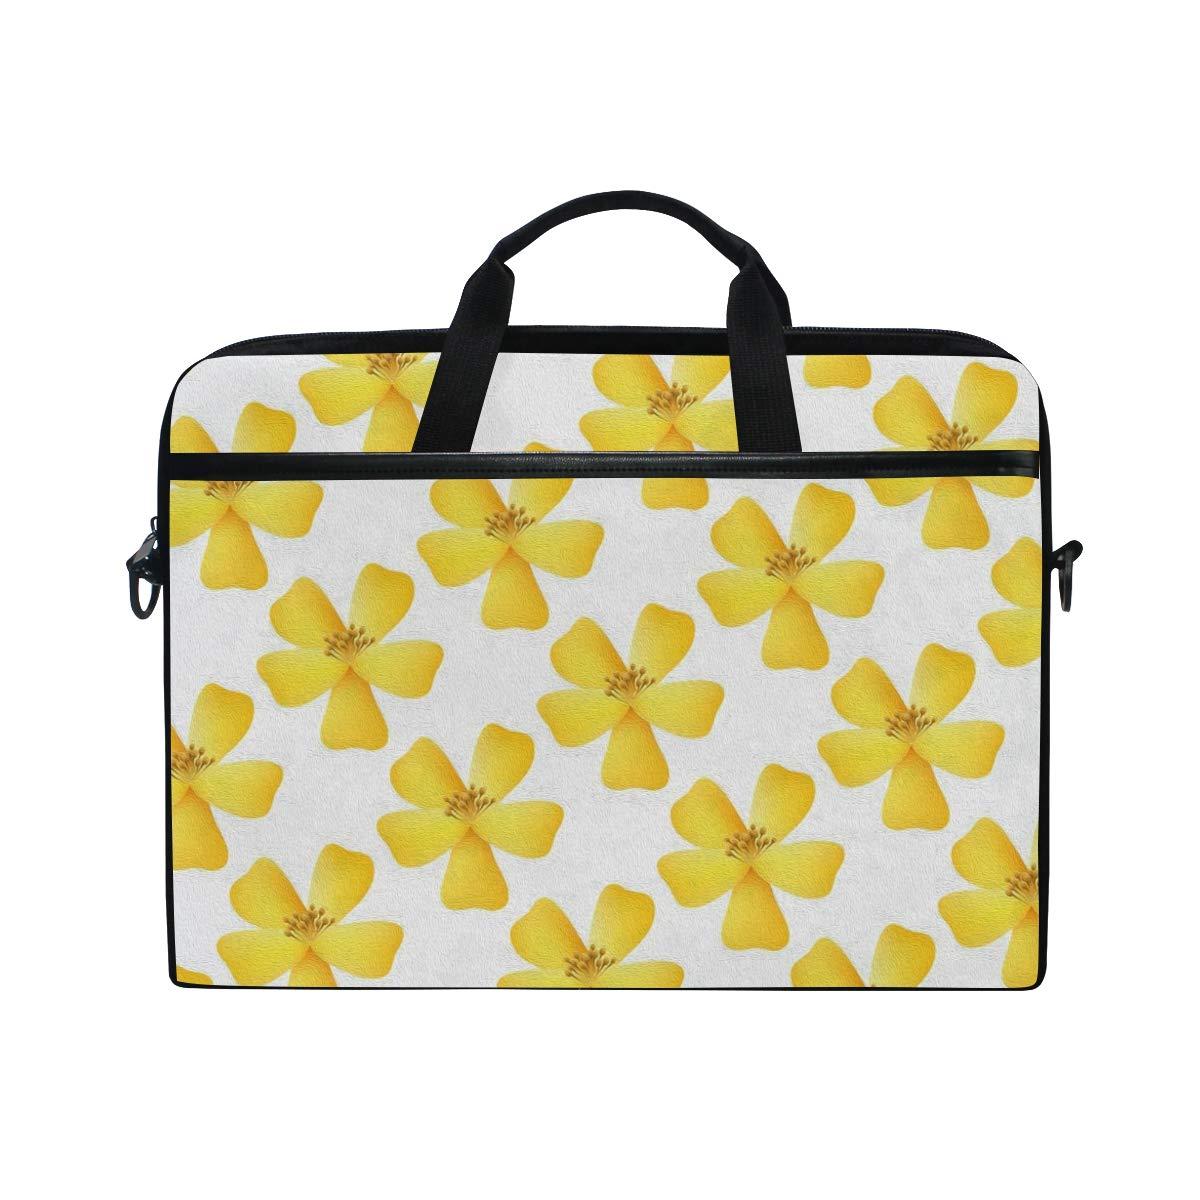 7541dc03dee0 Amazon.com  Laptop Briefcase Yellow Jasmine Flower Laptop Bag for Men Women Canvas  Shoulder Messenger Bag with Fits 15-15.4 Inch  Computers   Accessories